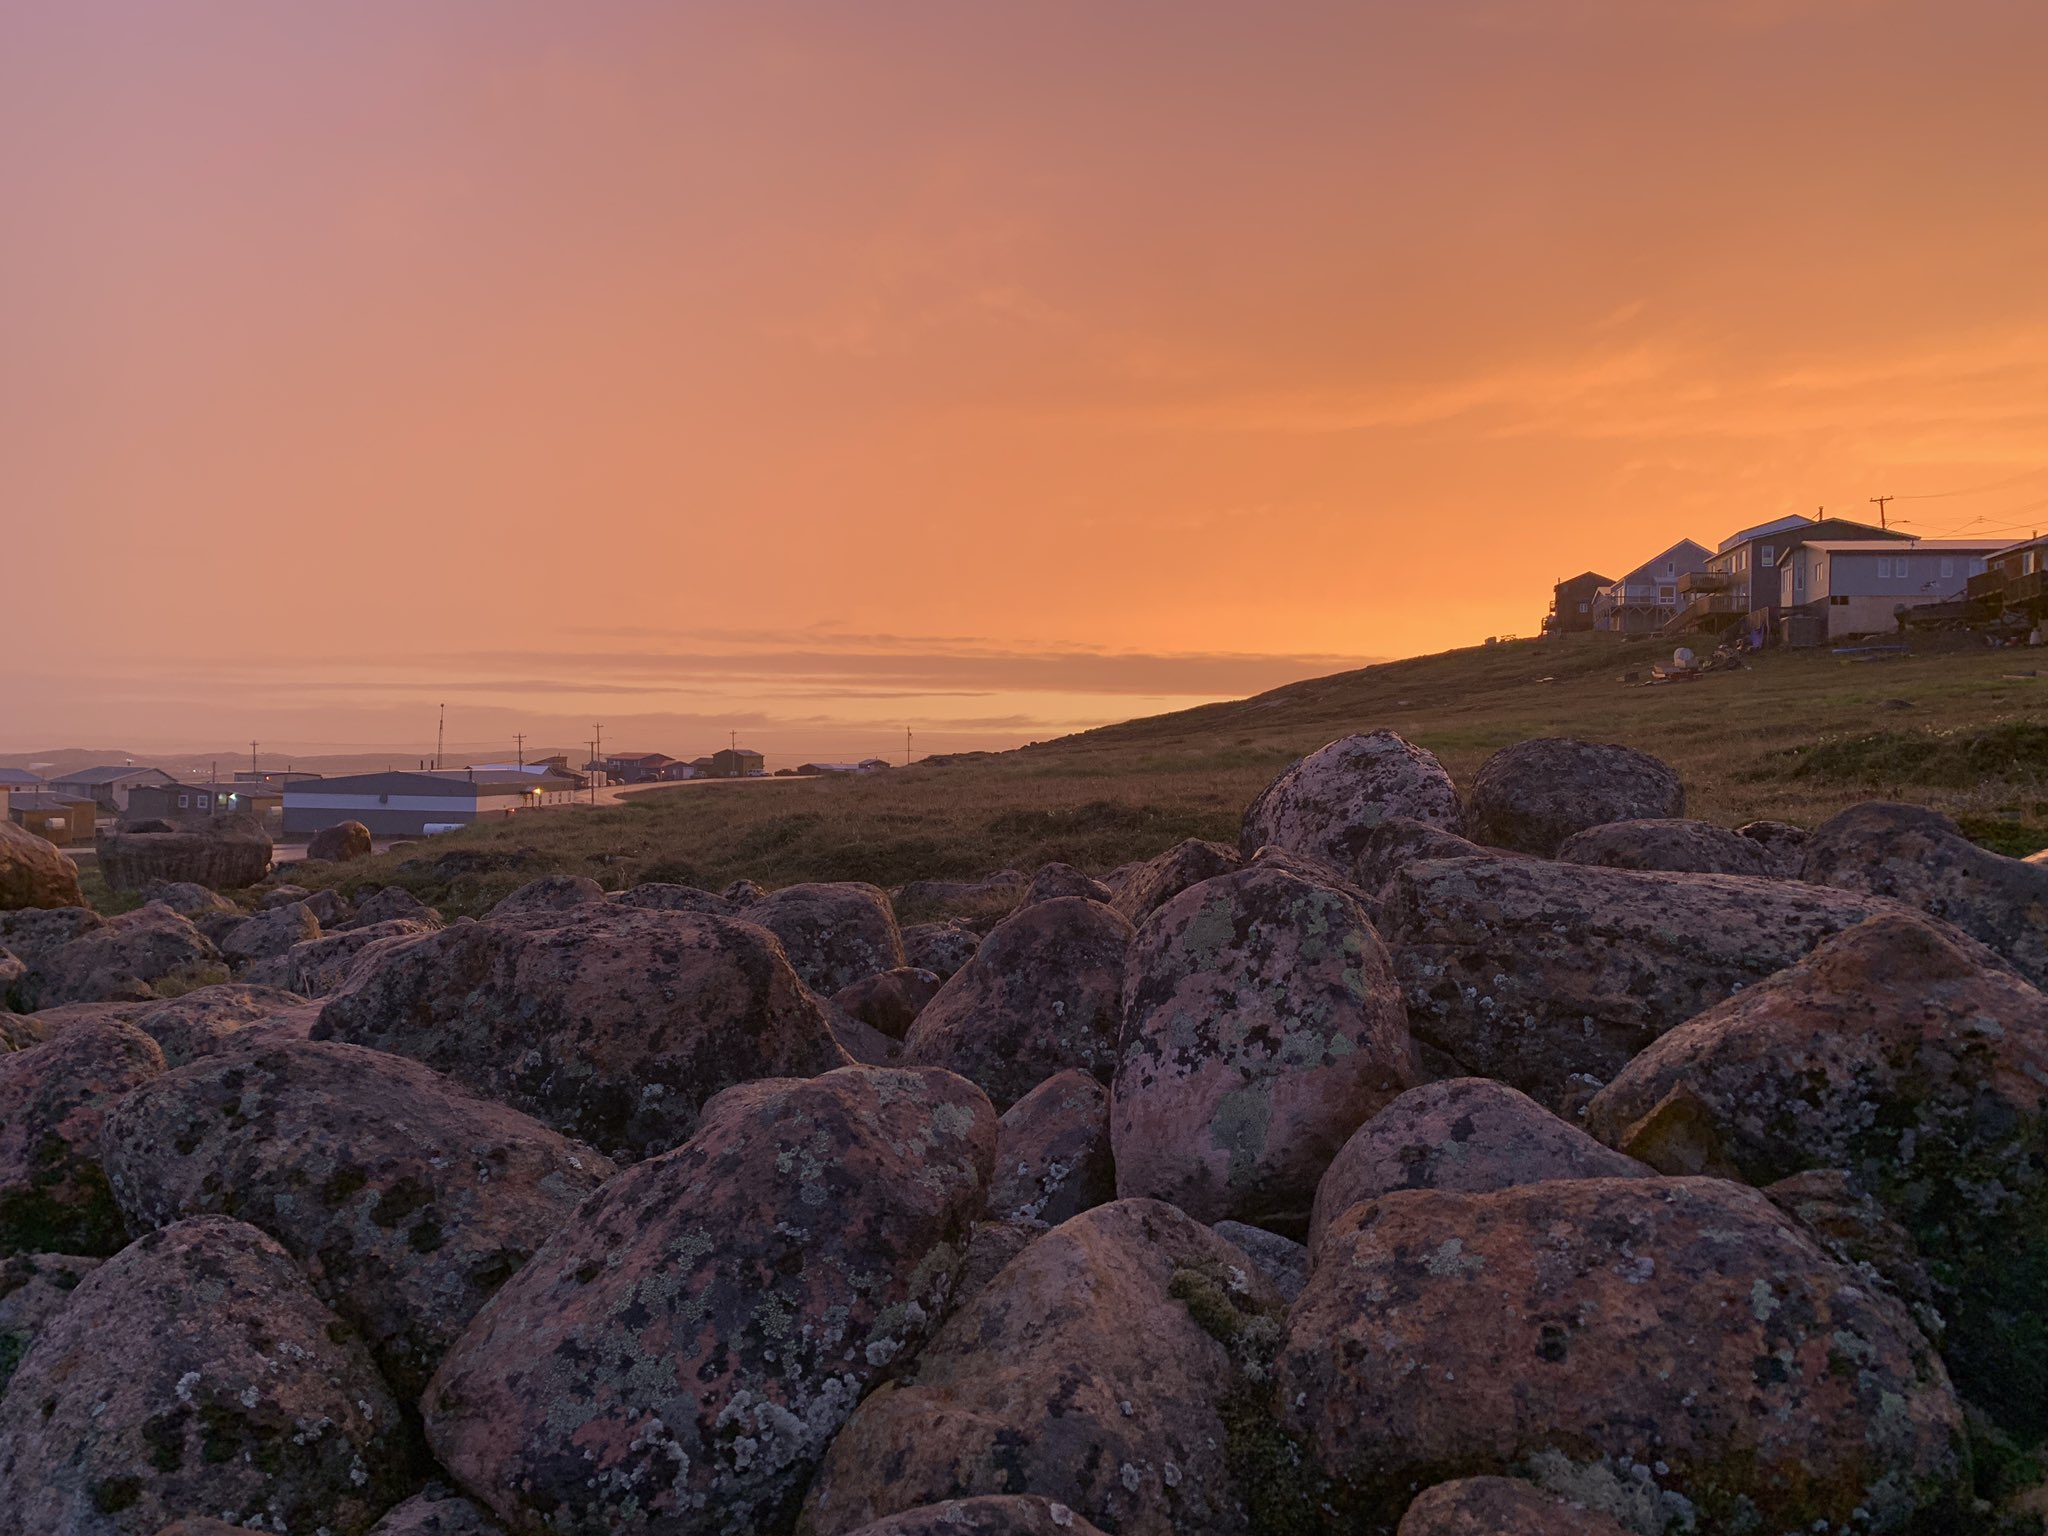 Iqaluit's Tundra Ridge neighbourhood is bathed in golden light during sunset July 13. (Photo by Frank Reardon)